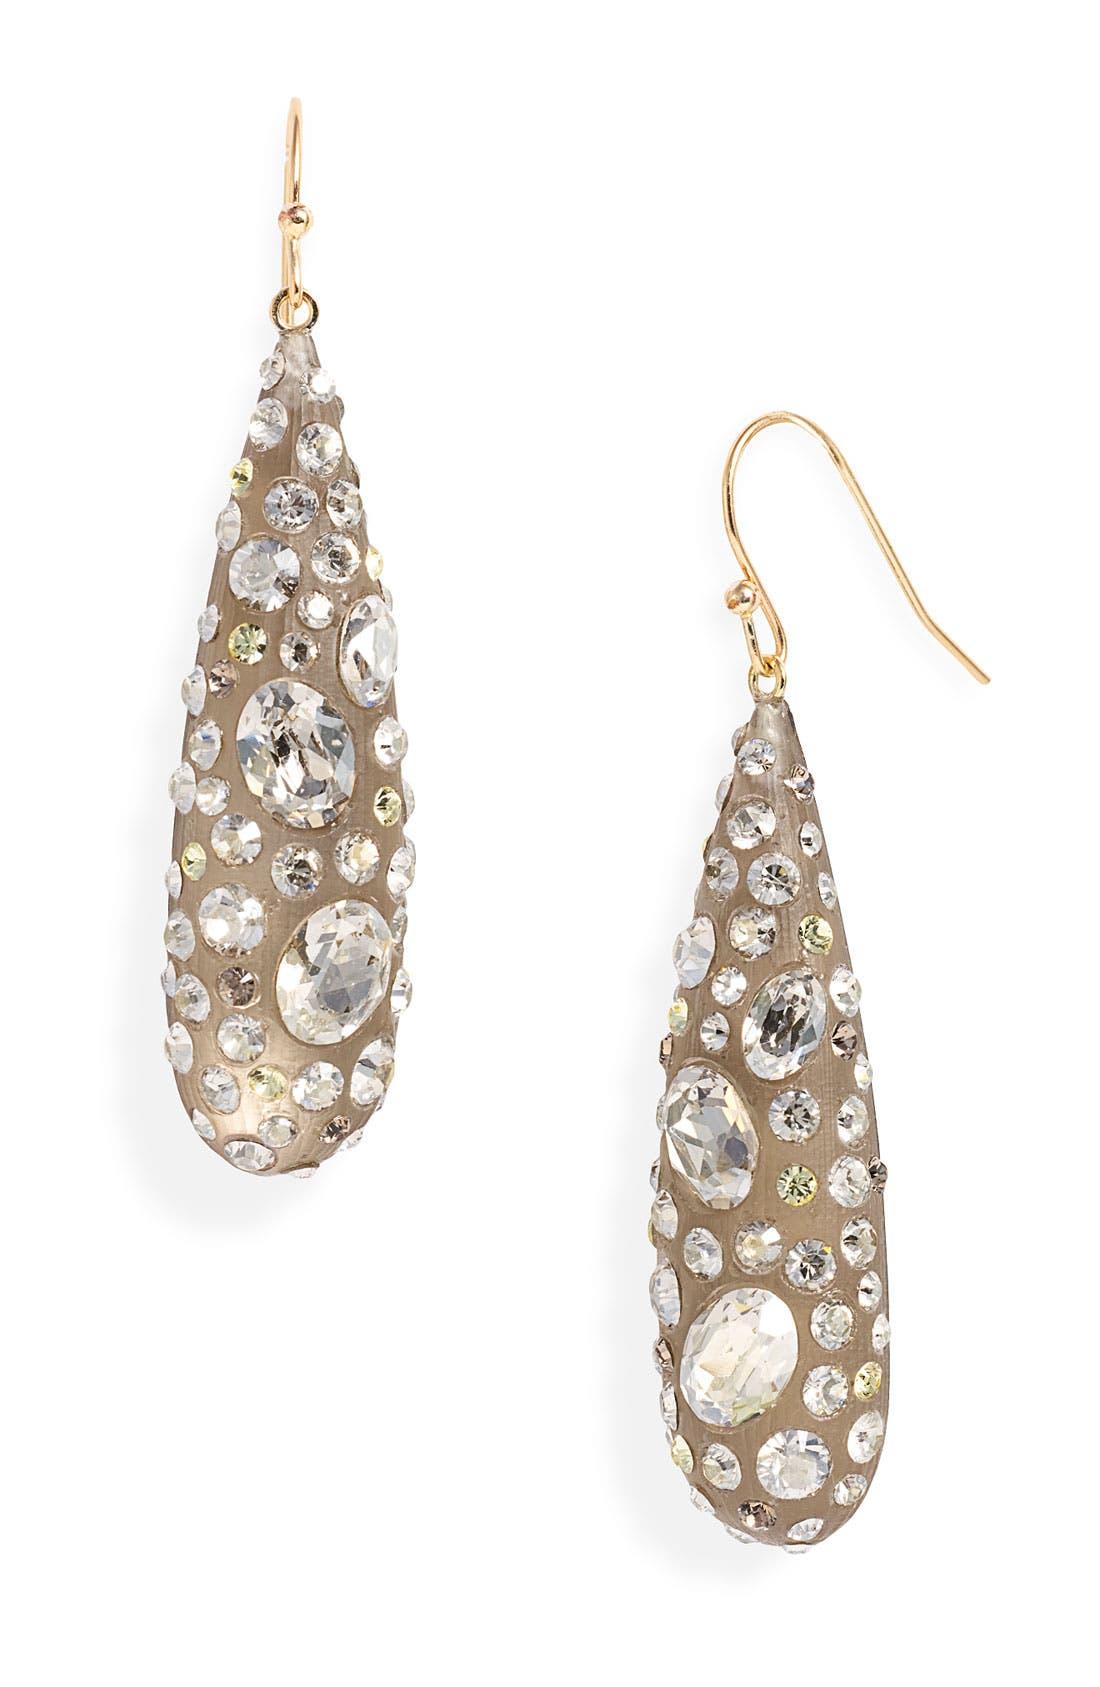 Alternate Image 1 Selected - Alexis Bittar 'Lucite® - Satin Dust' Teardrop Earrings